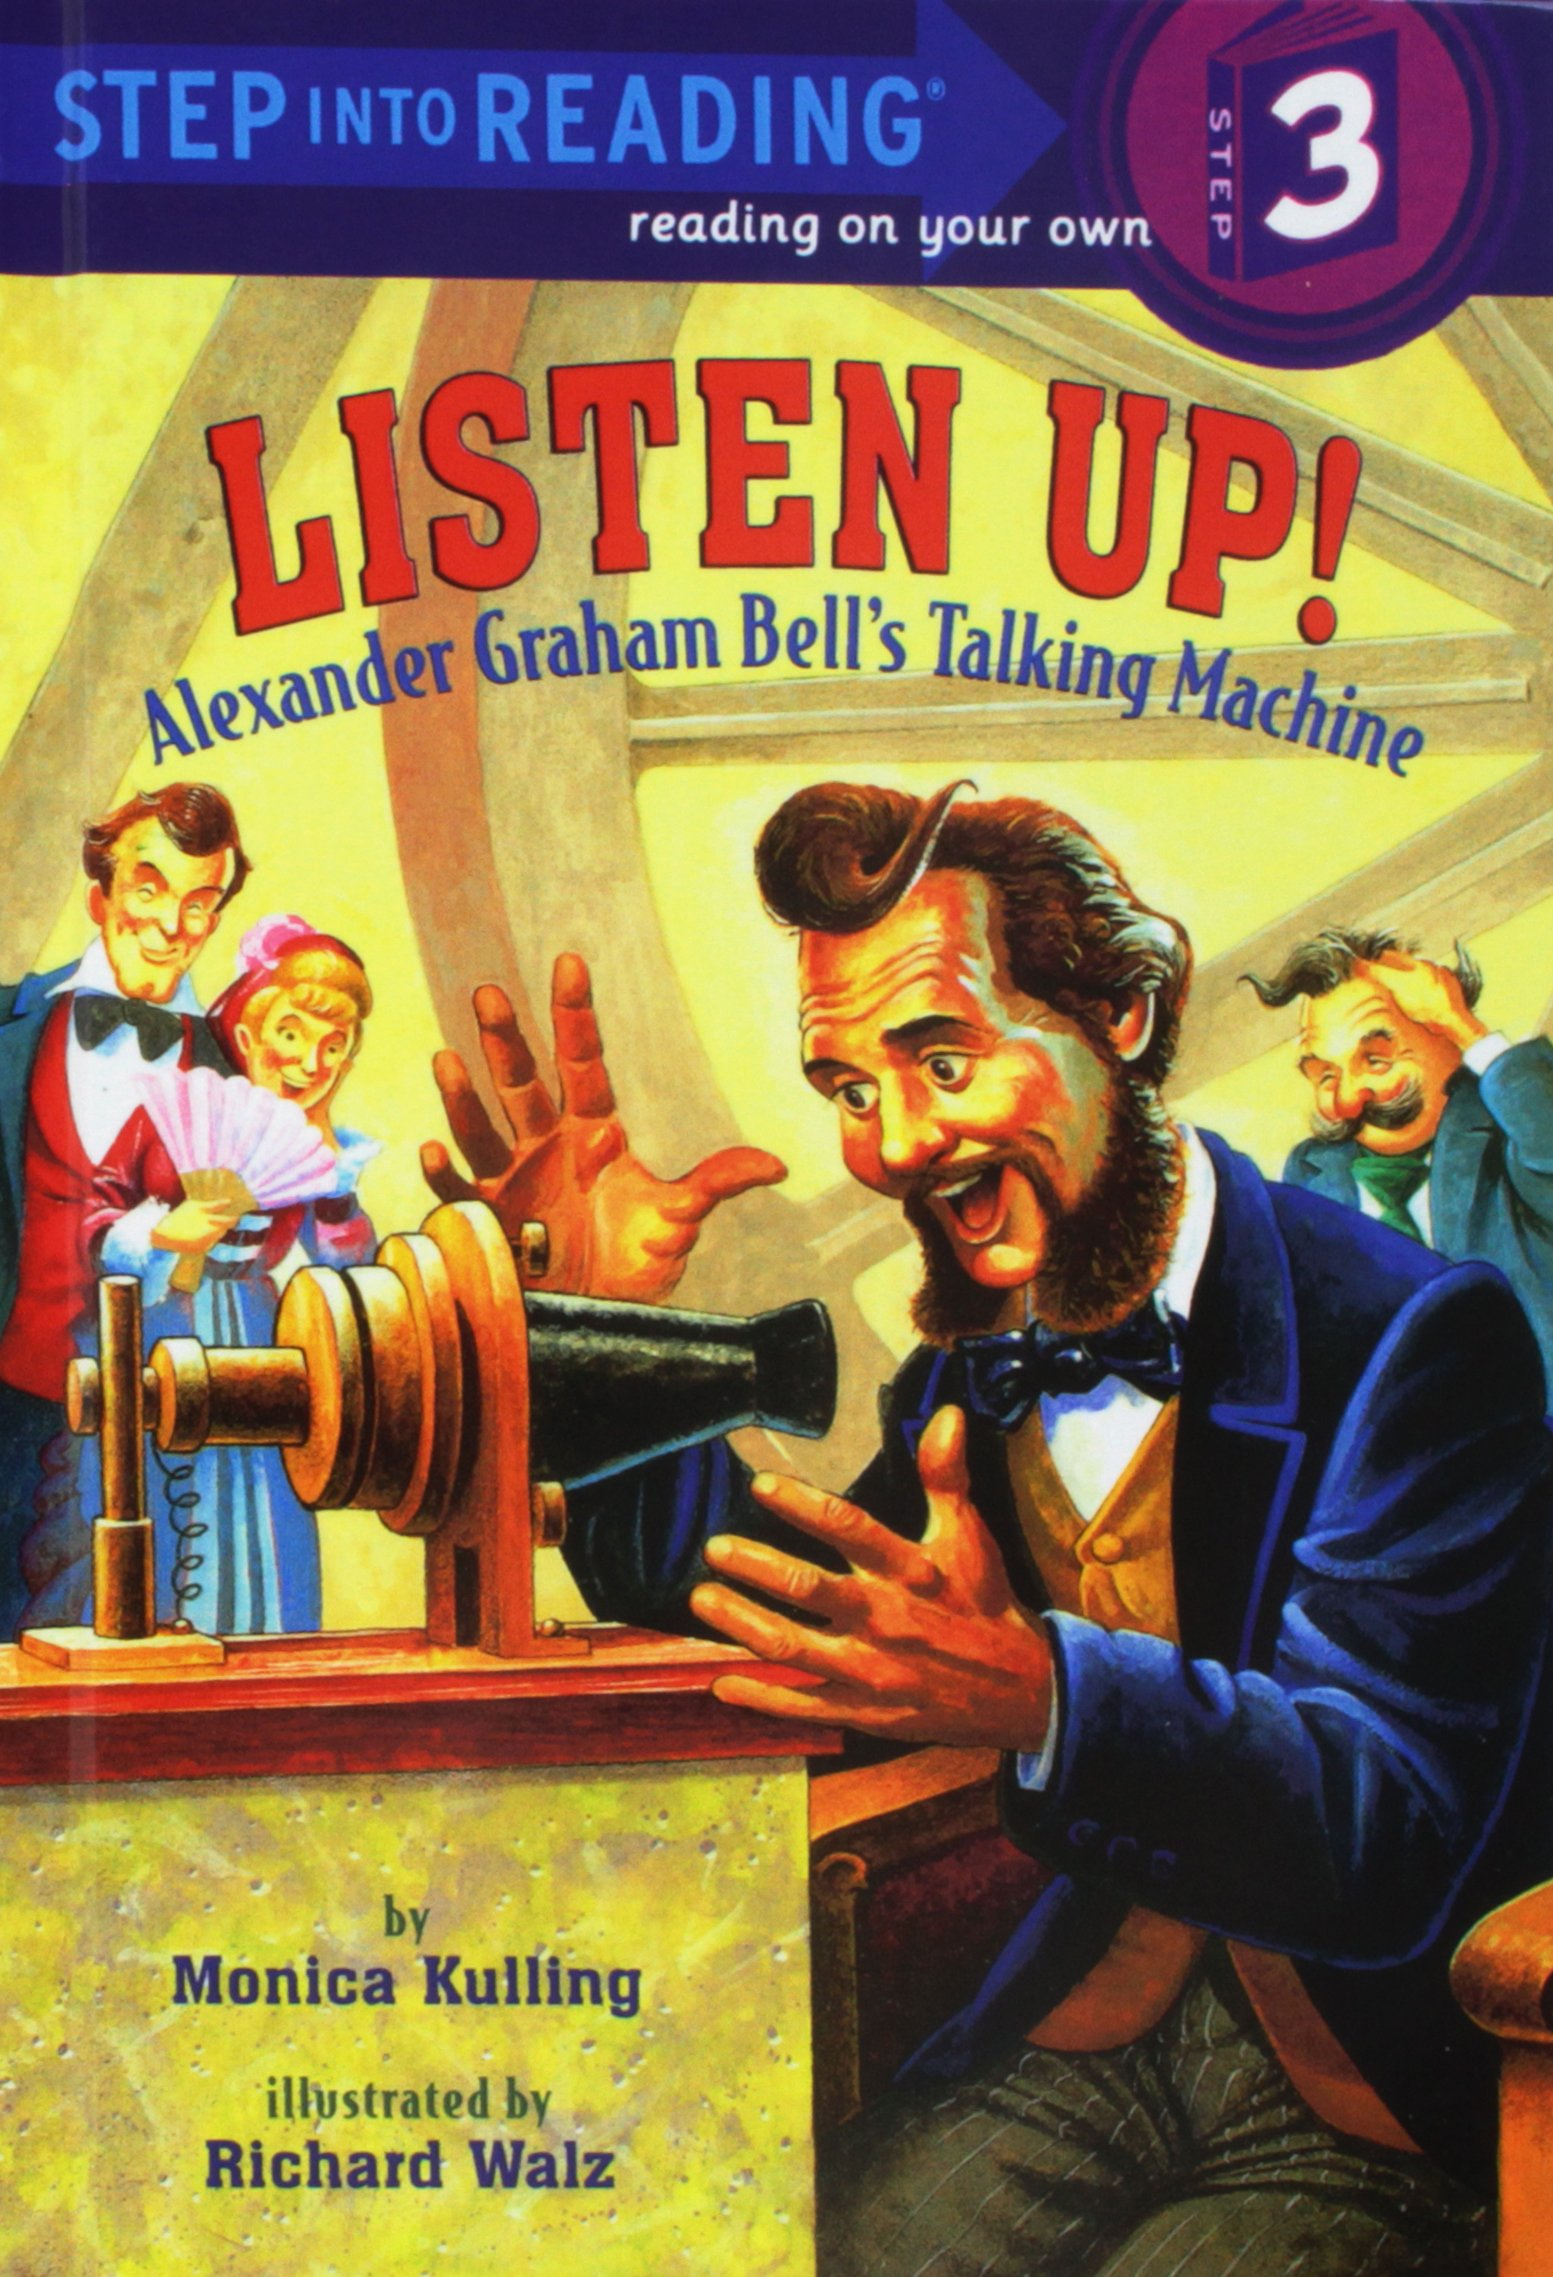 Download Listen Up!: Alexander Graham Bell's Talking Machine (Step Into Reading. Step 3) ebook